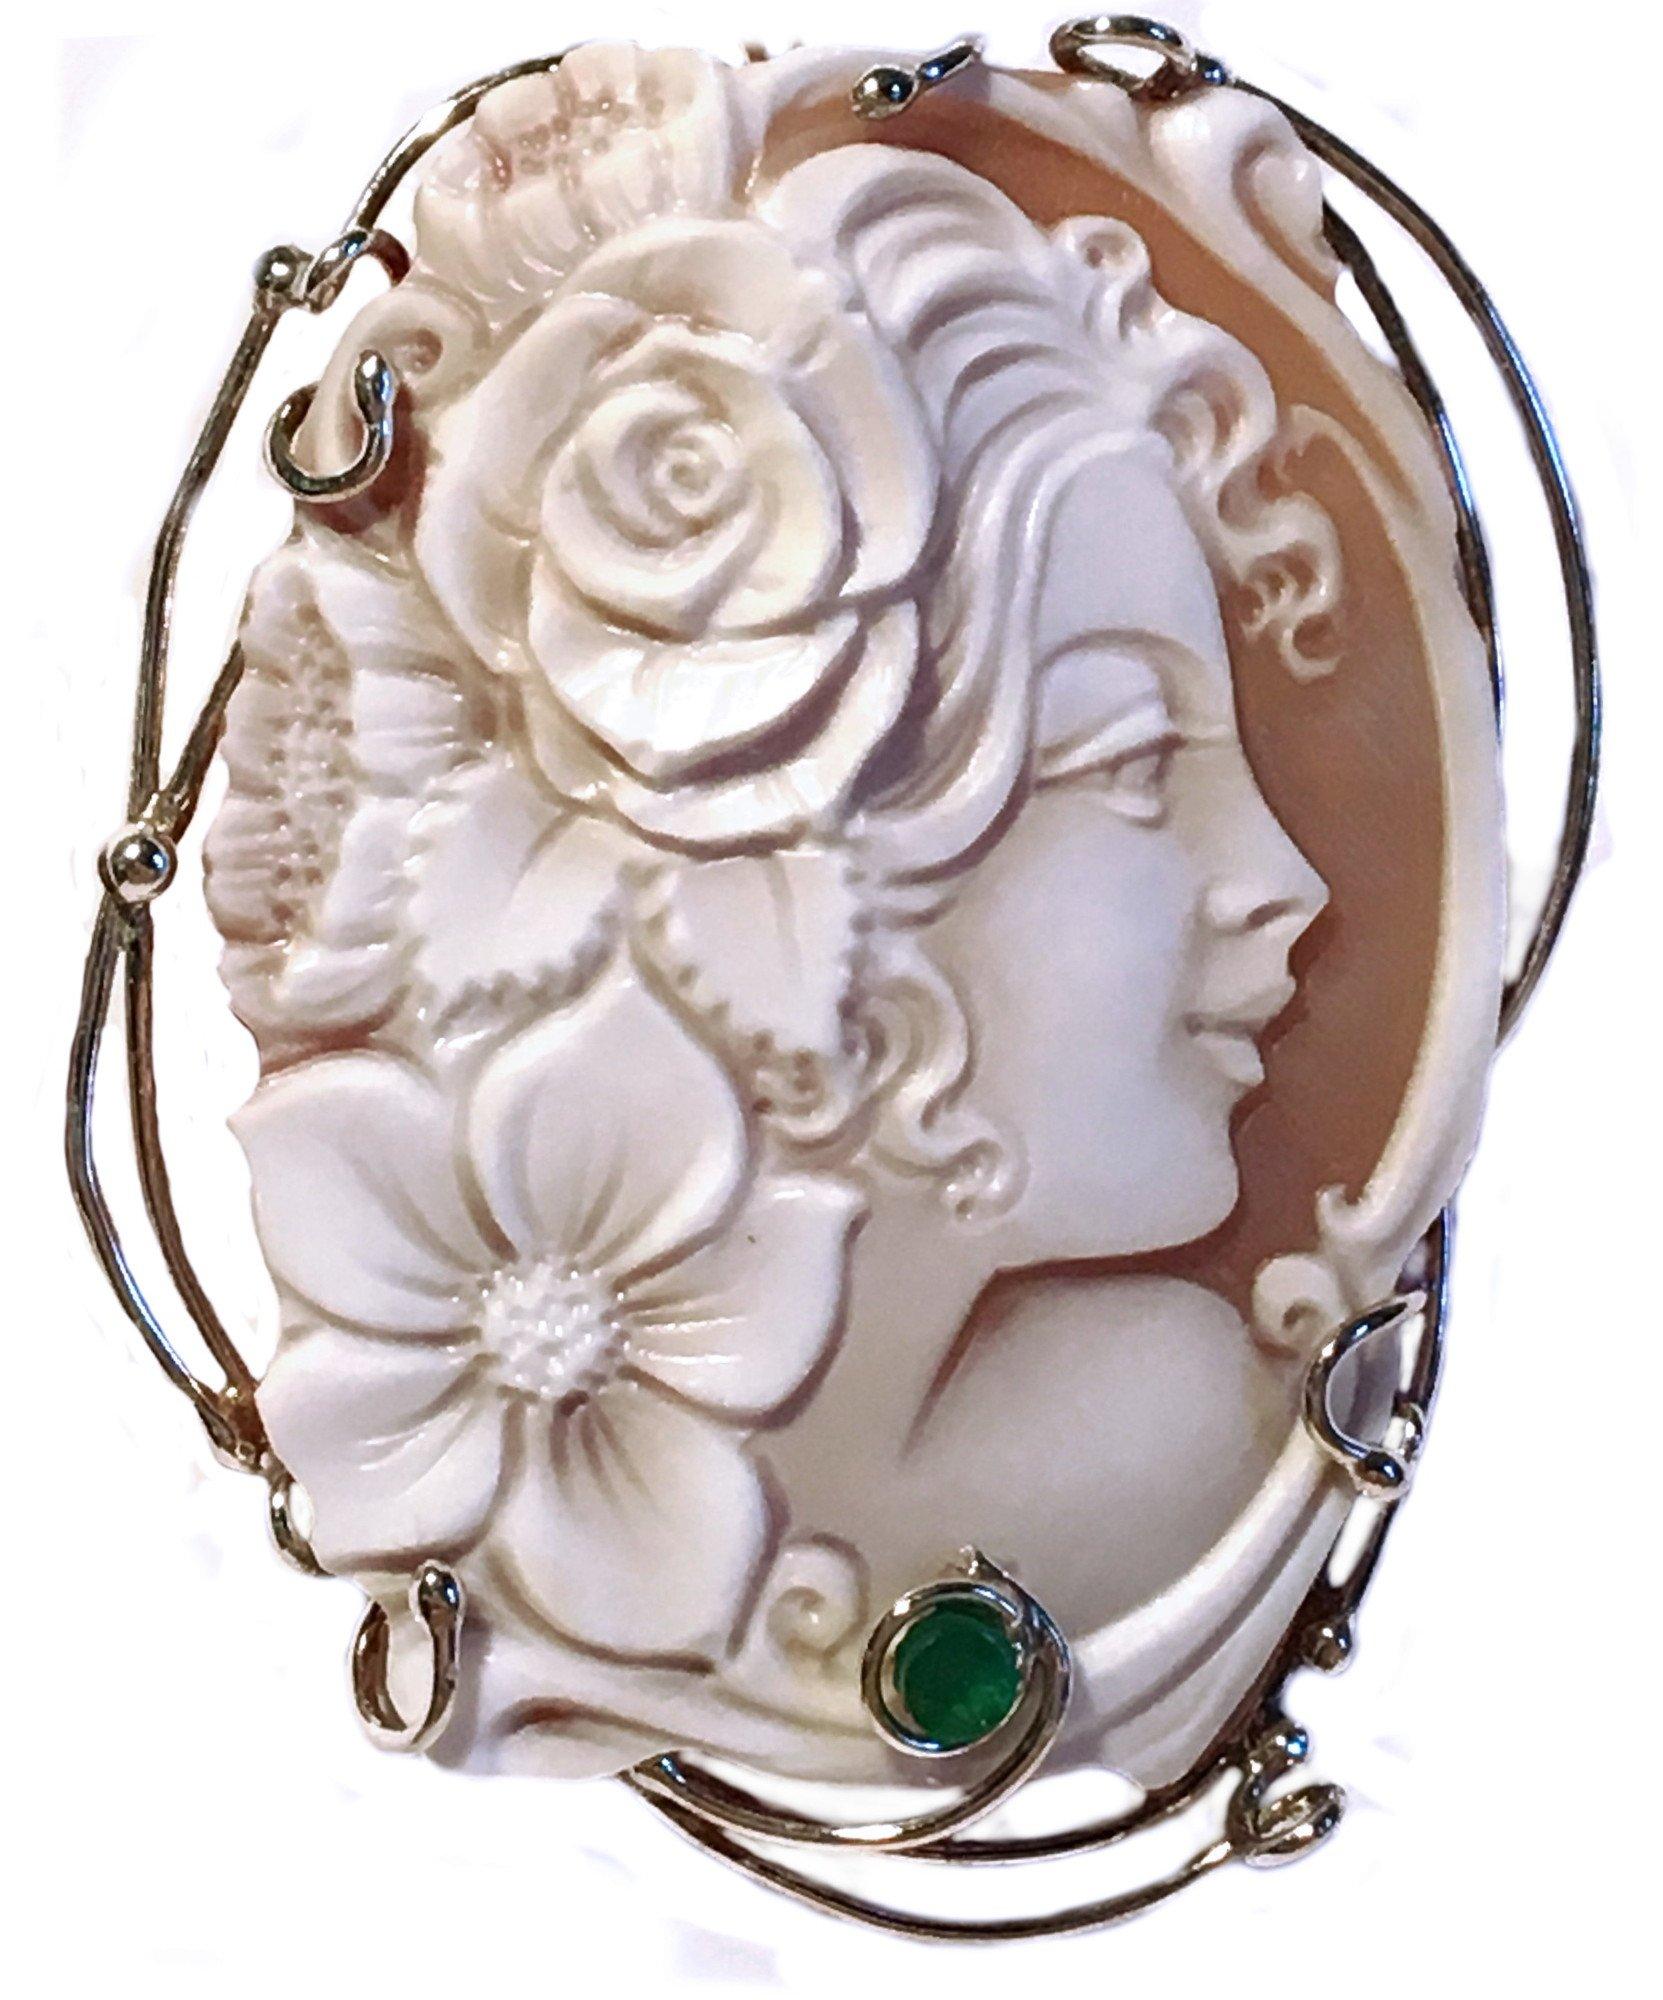 Cameo Pendant Summer Dream, Sterling Silver, Master Carved, Italian Sardonyx Shell, Natural Emerald